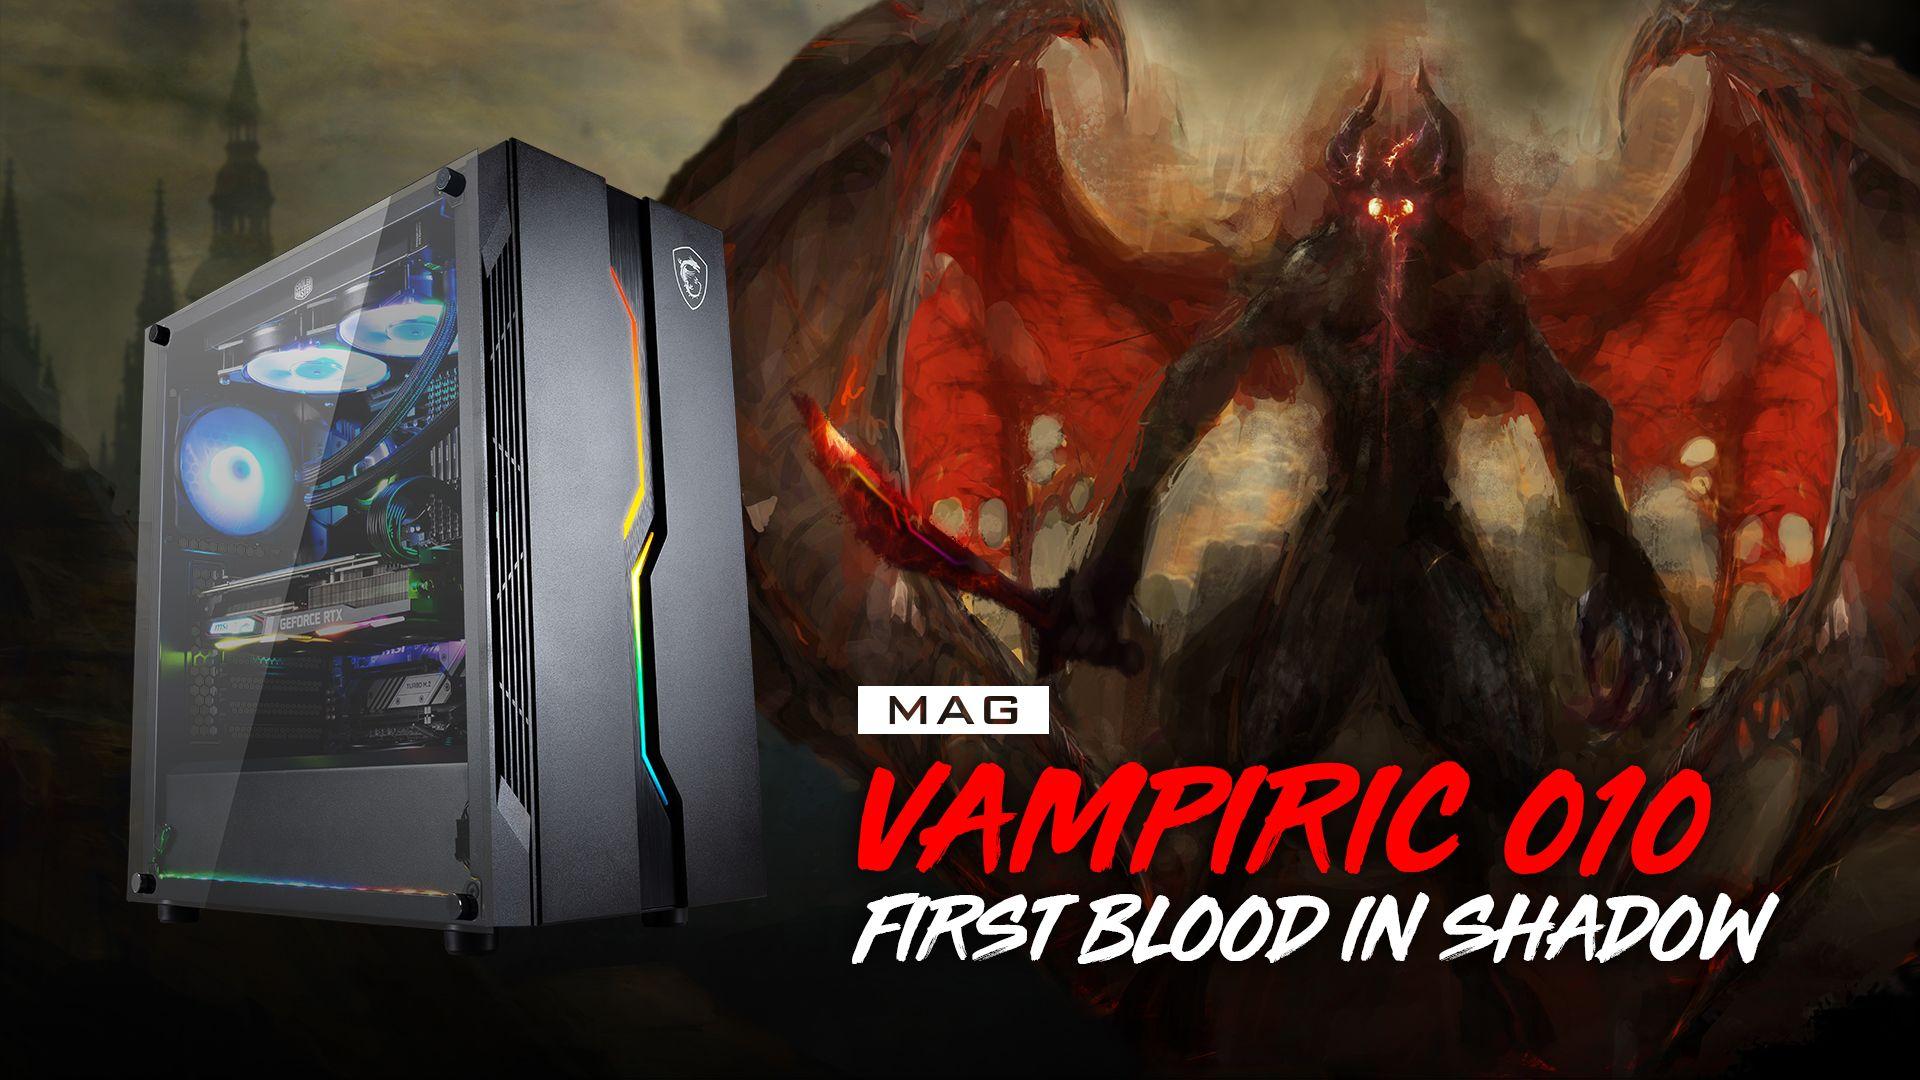 MSI MAG VAMPIRIC 010 CASE